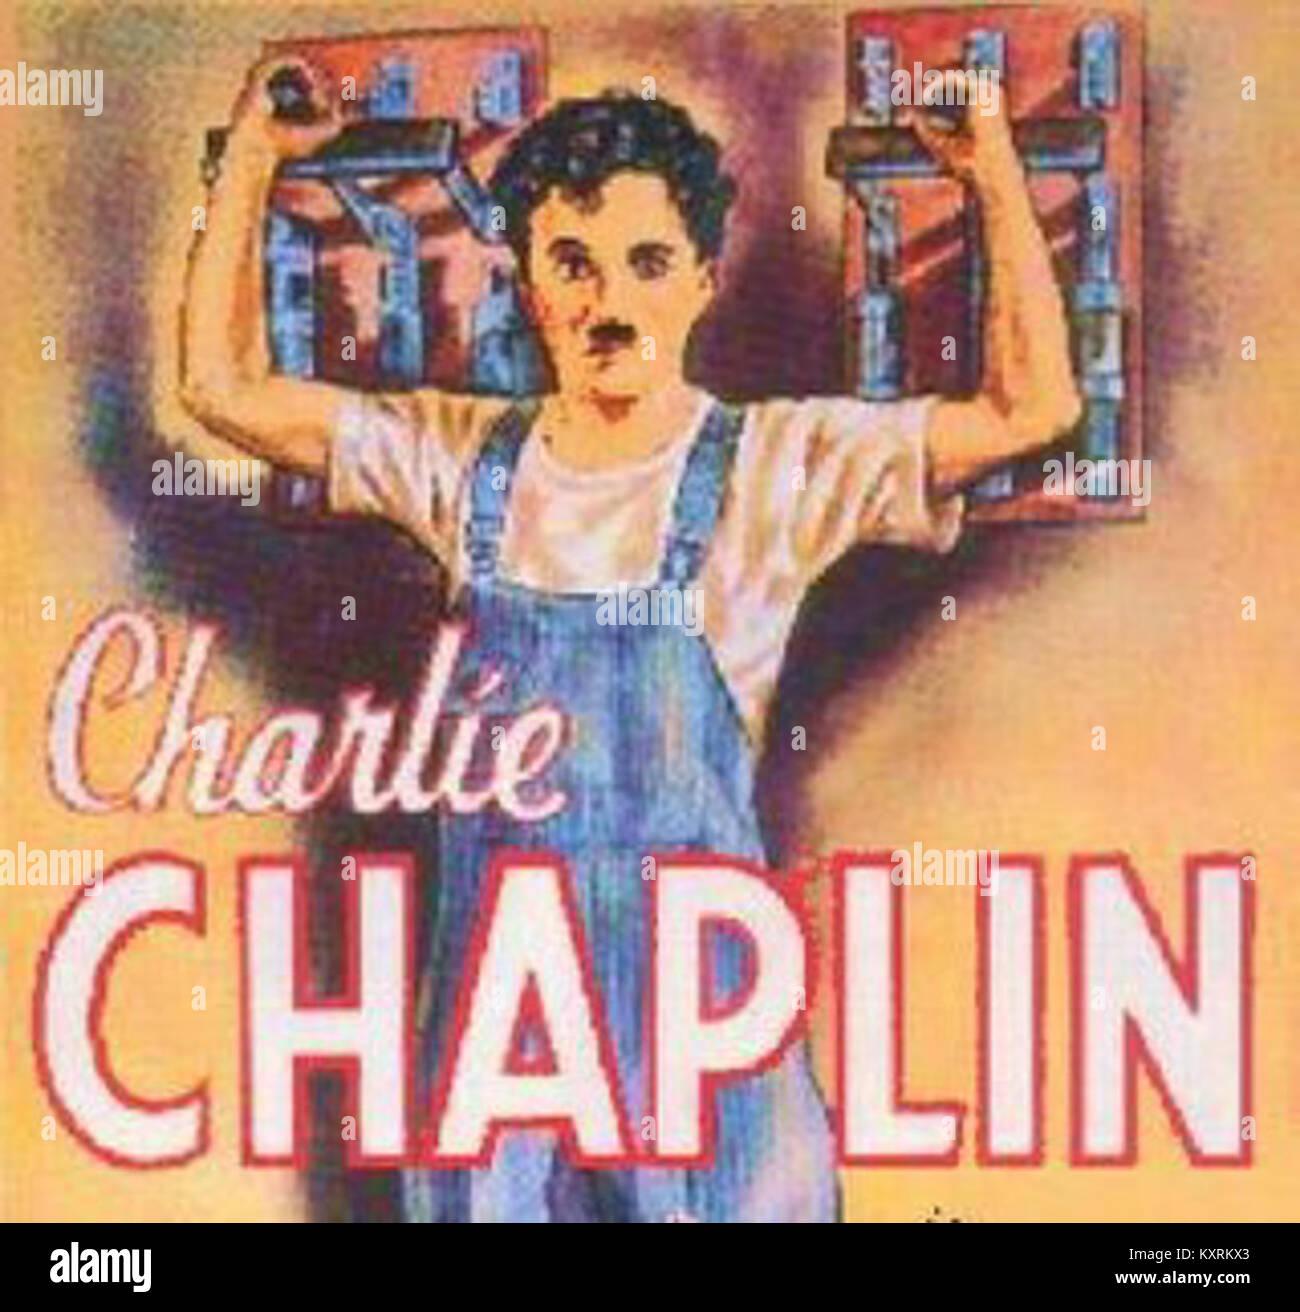 Charlie Chaplin Poster Stock Photos & Charlie Chaplin ...